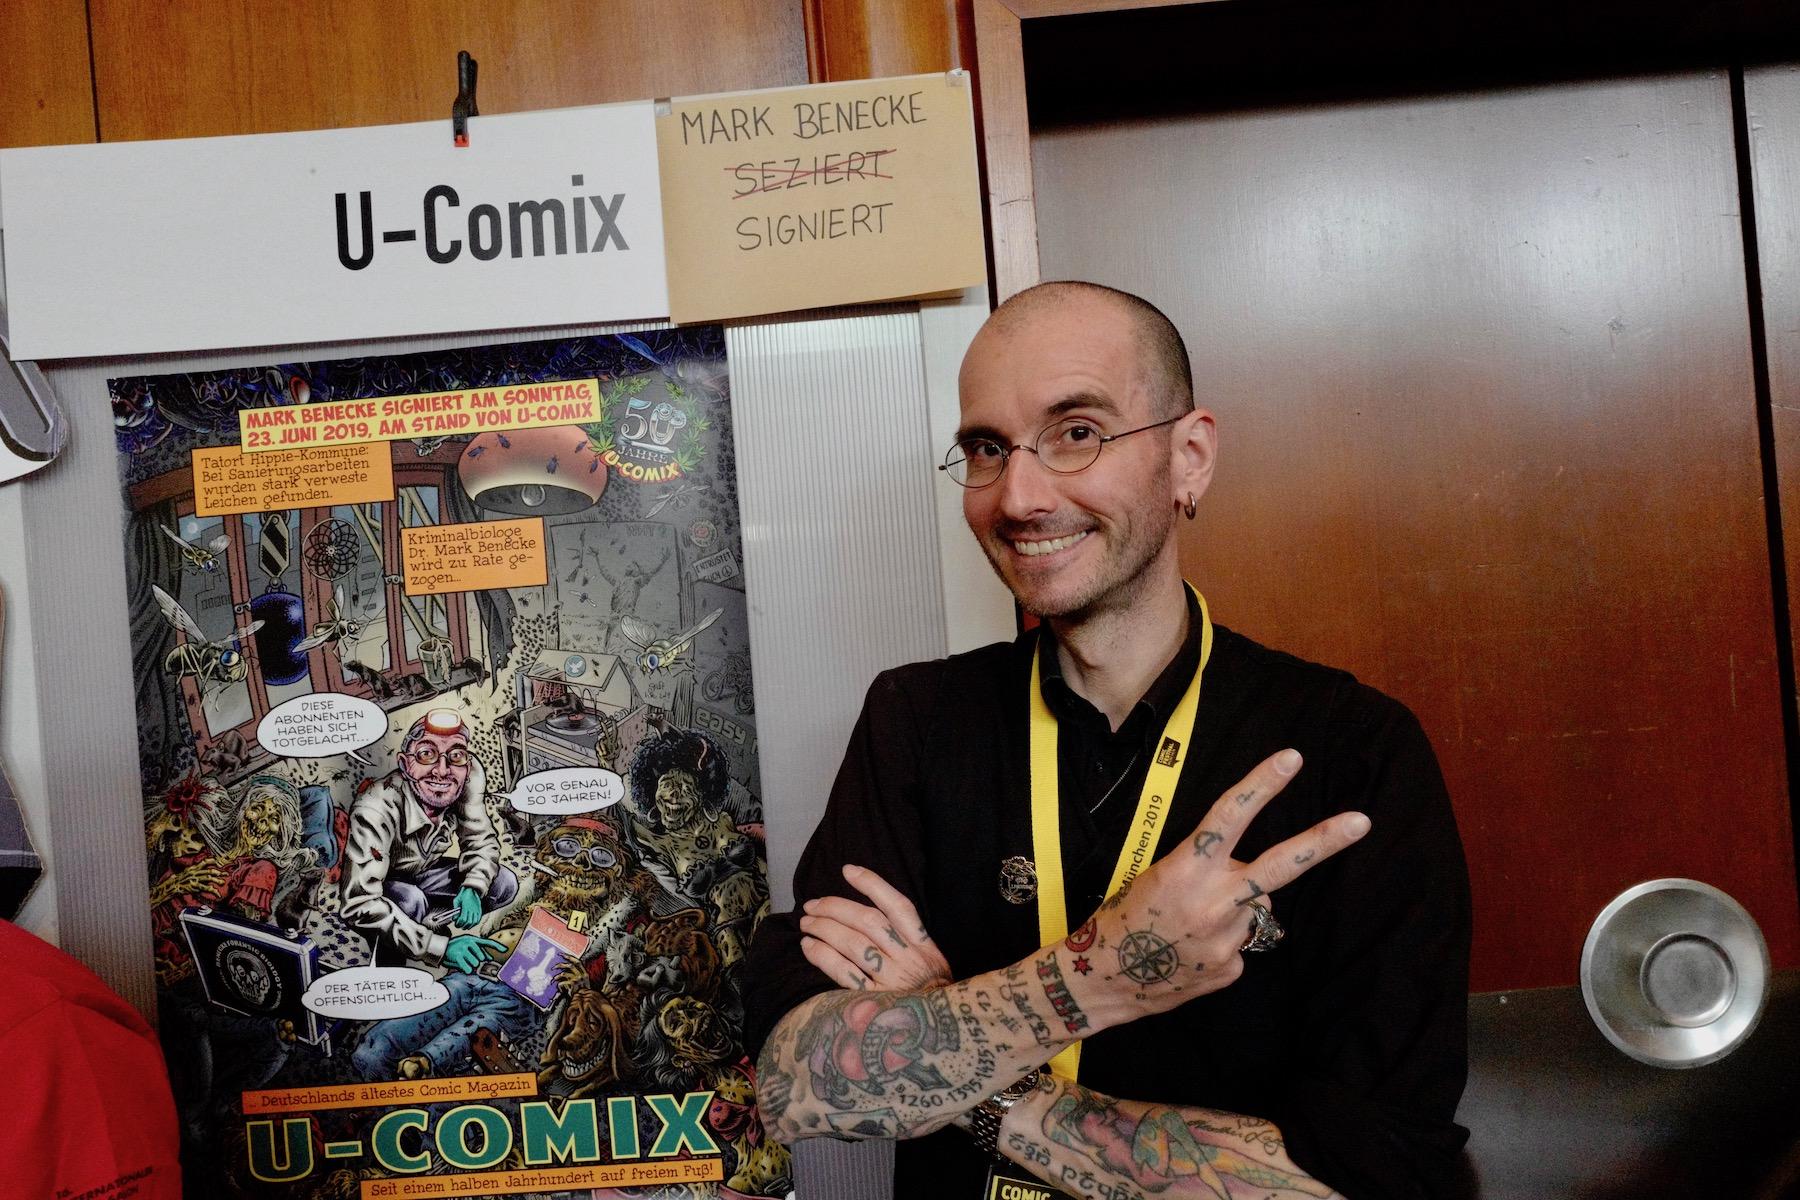 mark_benecke_cfm19_comic_festival_muenchen_u_comix - 42.jpg